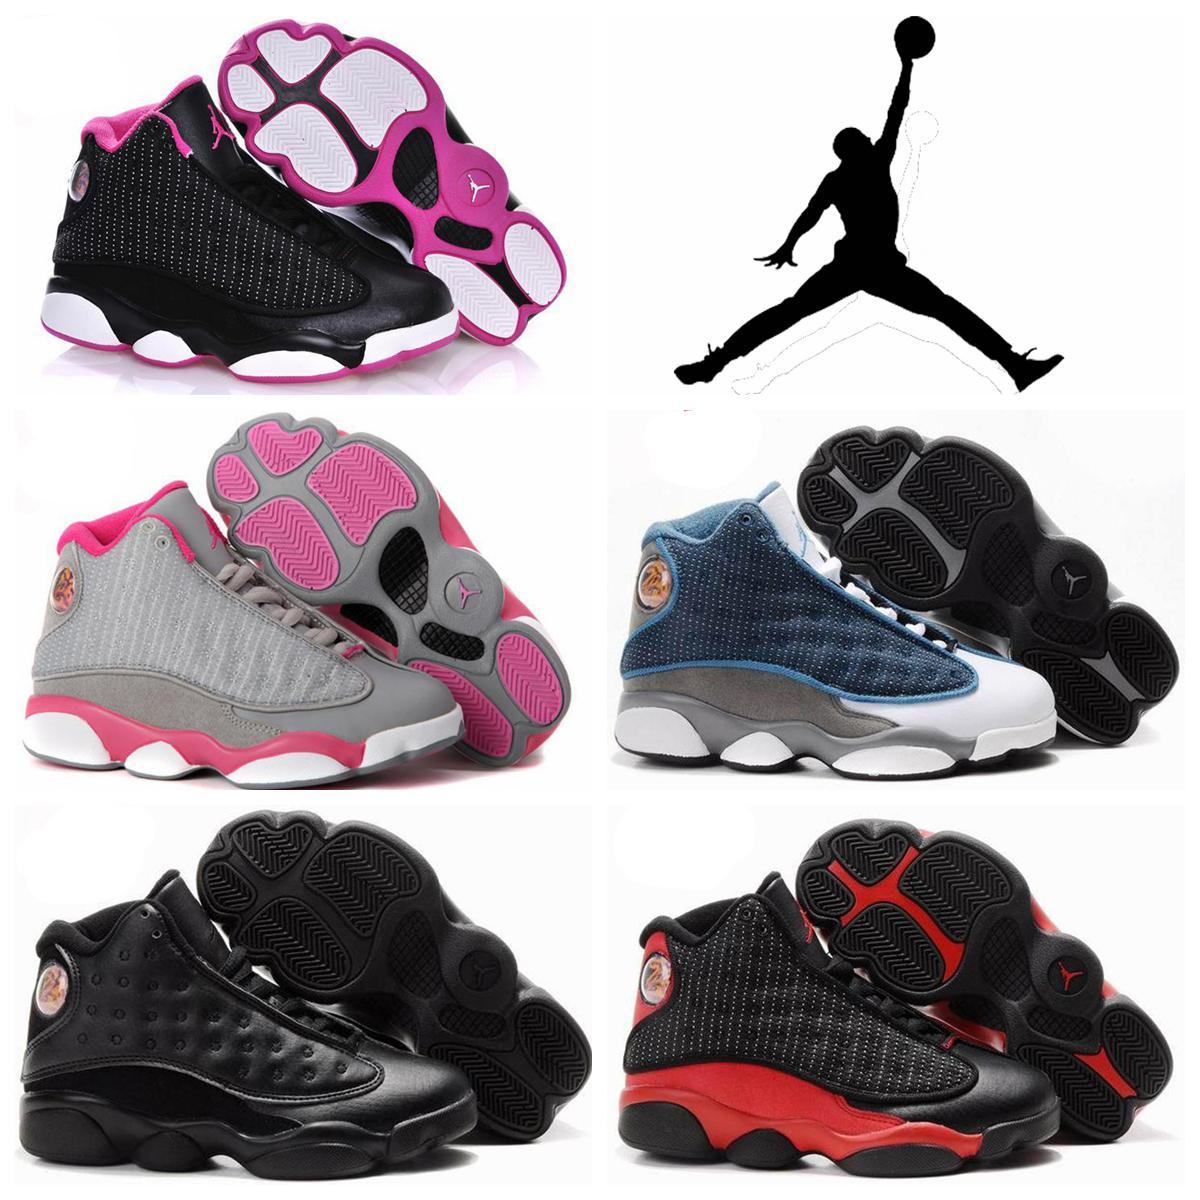 Acheter 2016 Nouveau Nike Air Jordan 13 Retro Xiii Chaussures